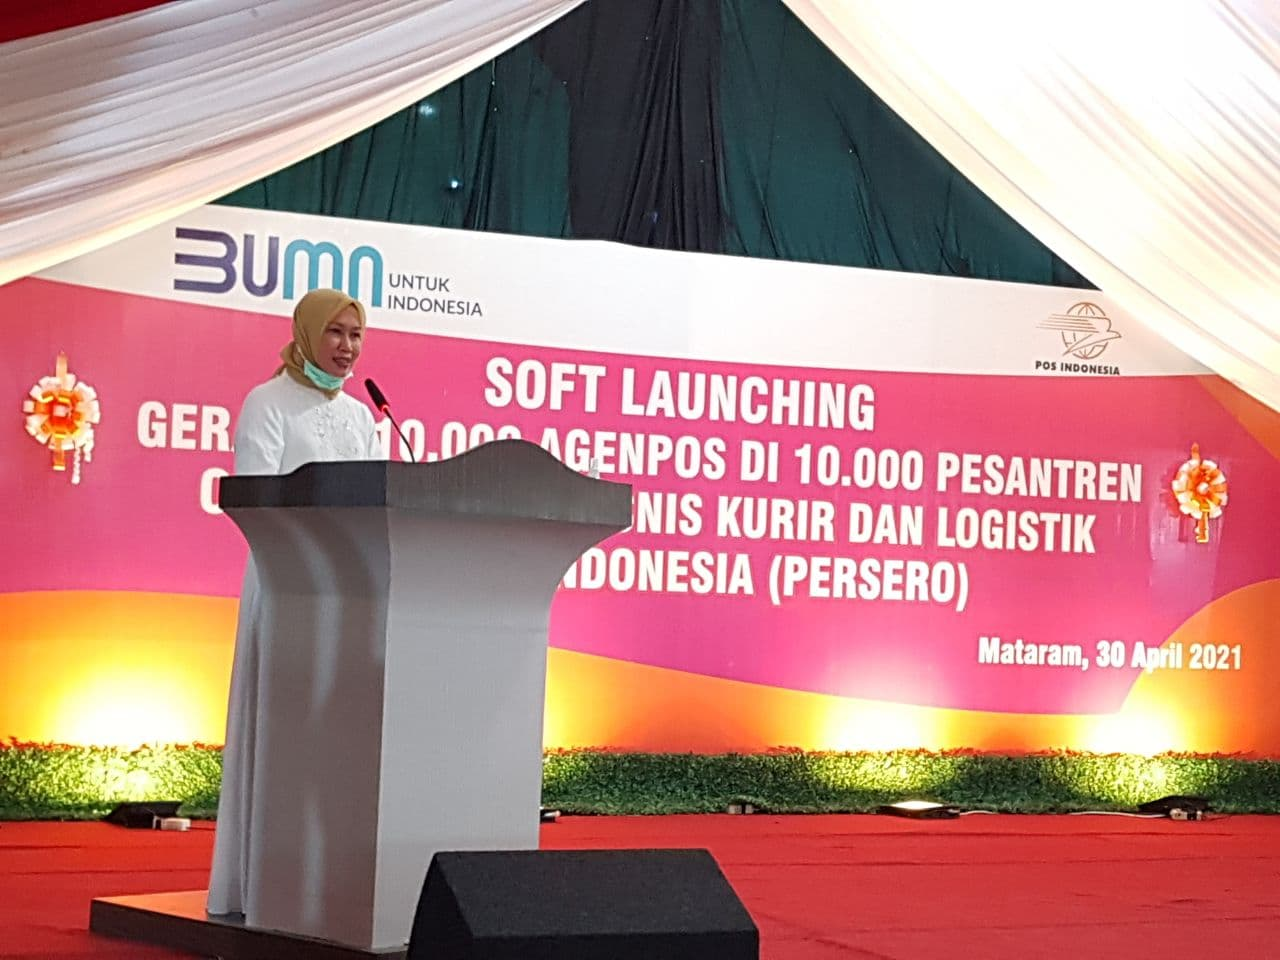 Pos Indonesia Garap Kawasan Indonesia Timur, Bidik Ratusan Pesantren di Mataram